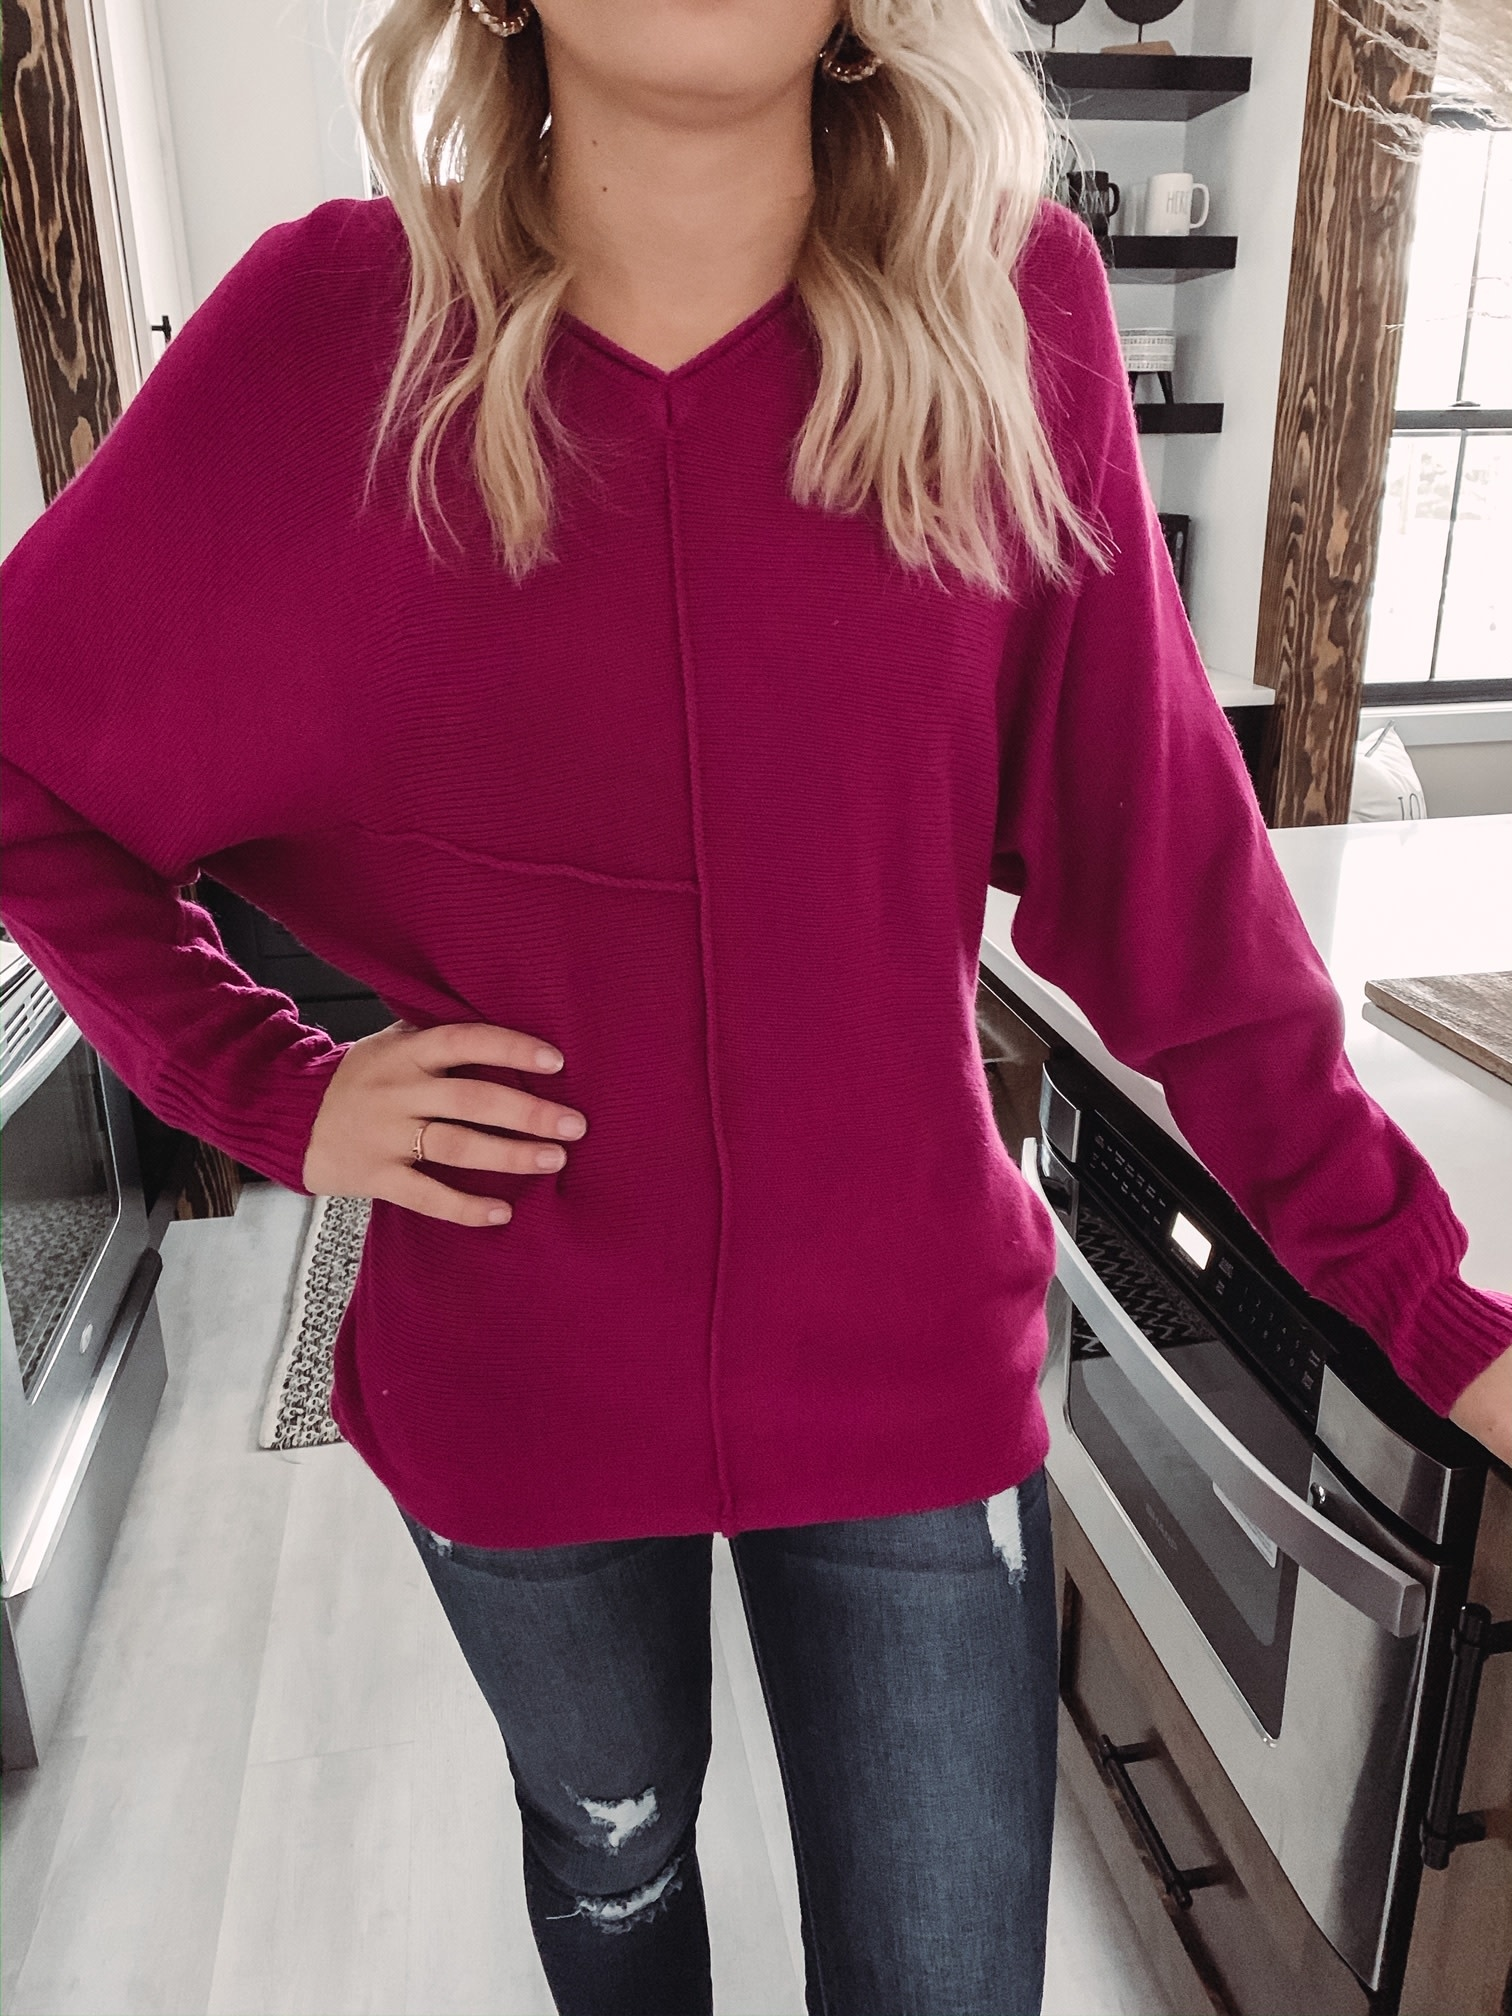 Harlow Magenta Sweater